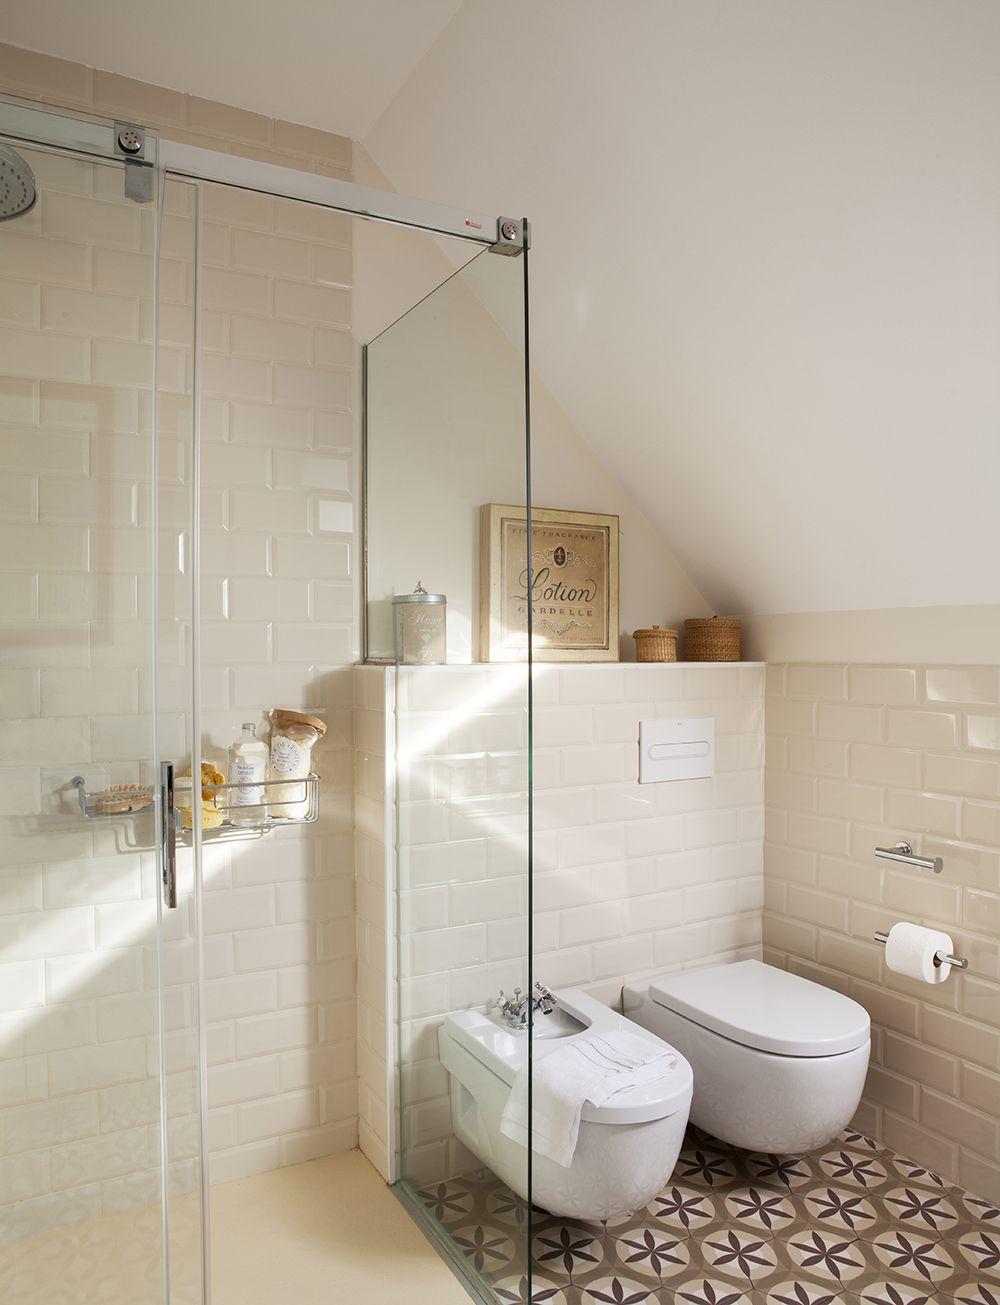 Divide con separaciones de cristal en 2019 ba os pinterest ba os duchas y ba os modernos - Mueble bano estrecho ...